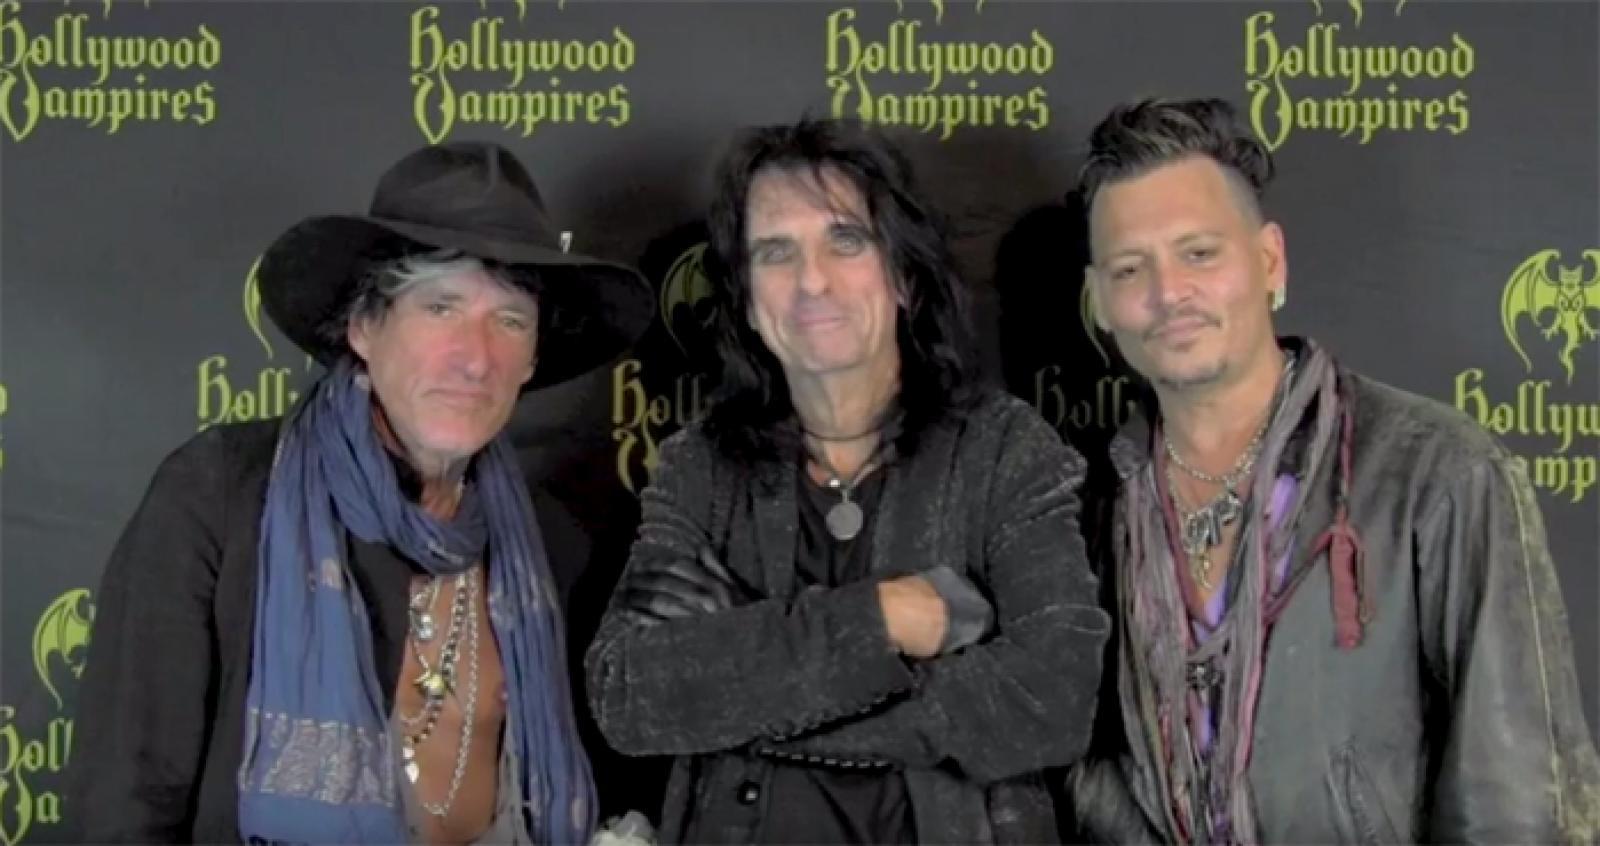 Hollywood Vampires News